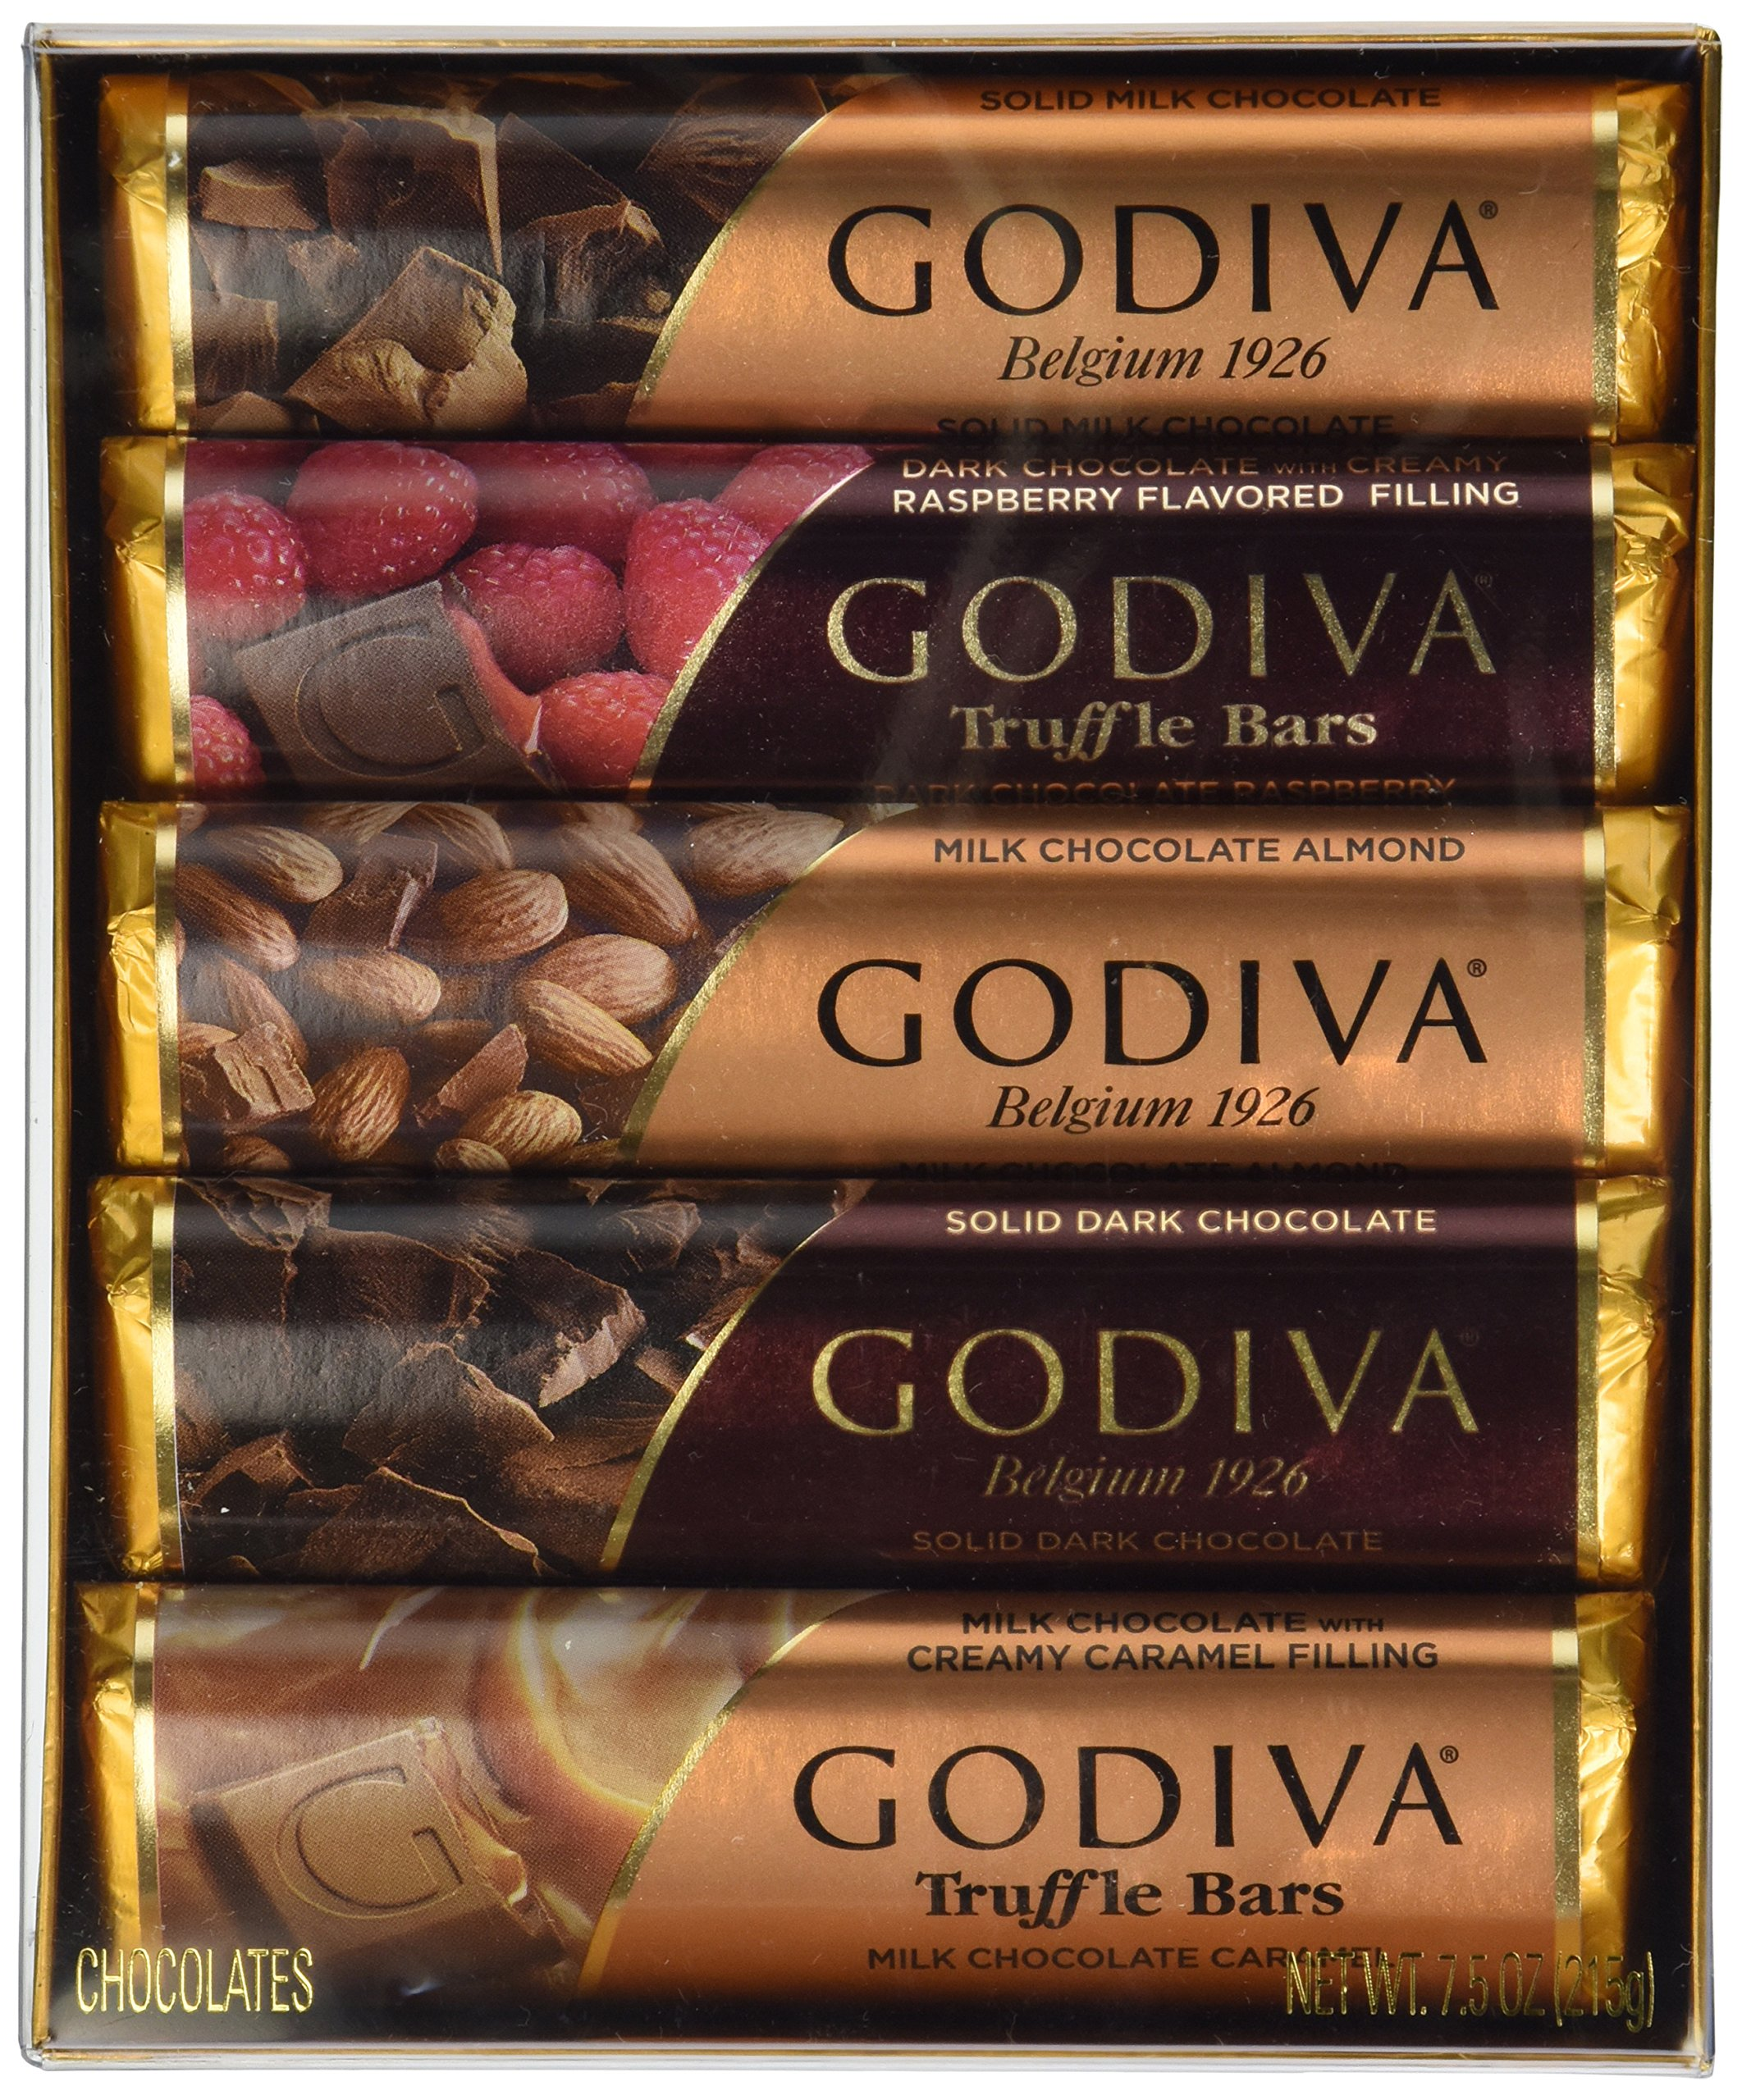 Amazon.com : Godiva Classic Chocolate Bar Gift Set